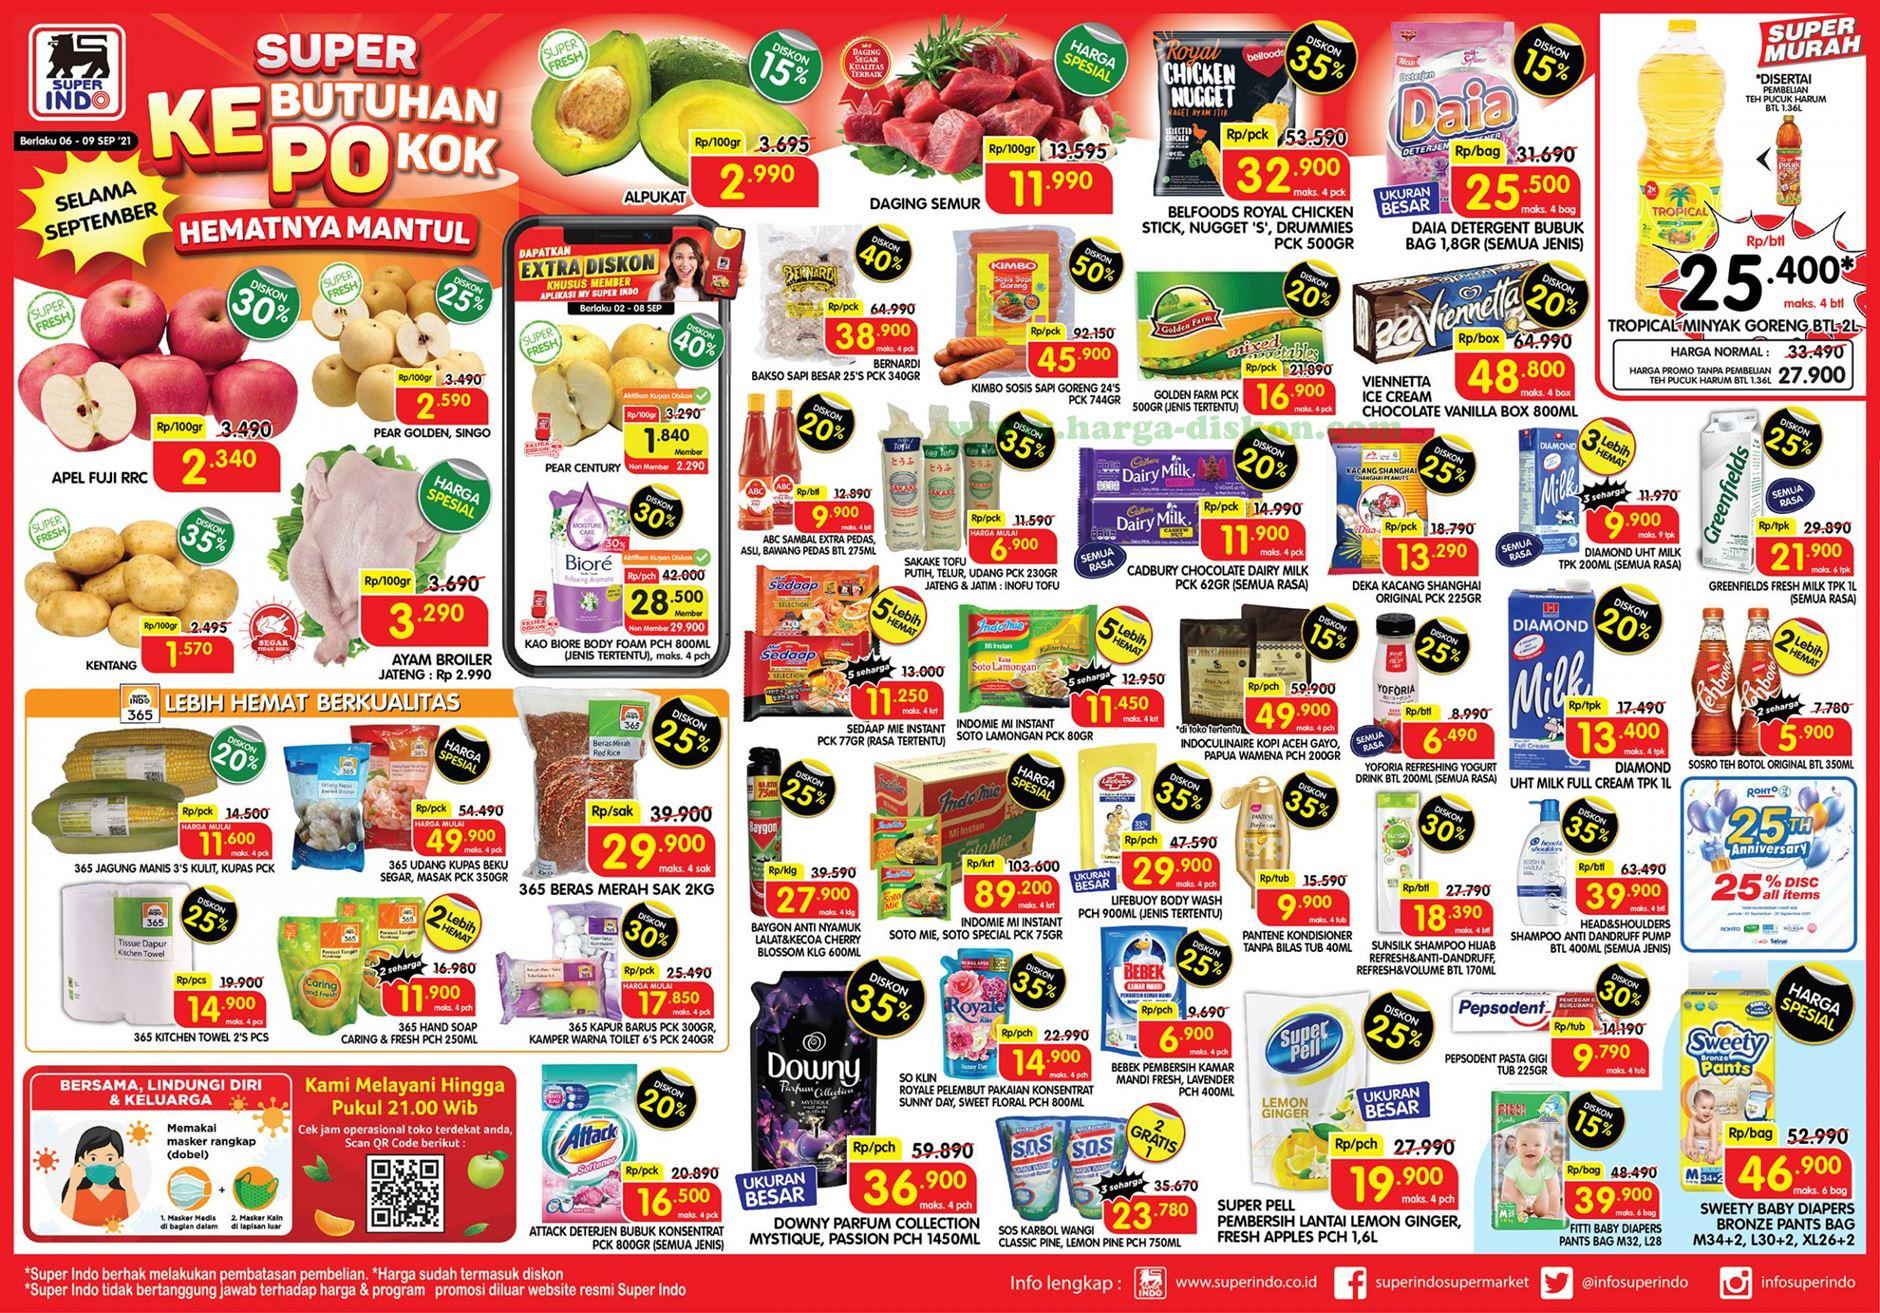 Promo SUPER INDO Awal Pekan Weekday Promo 06 - 09 September 2021